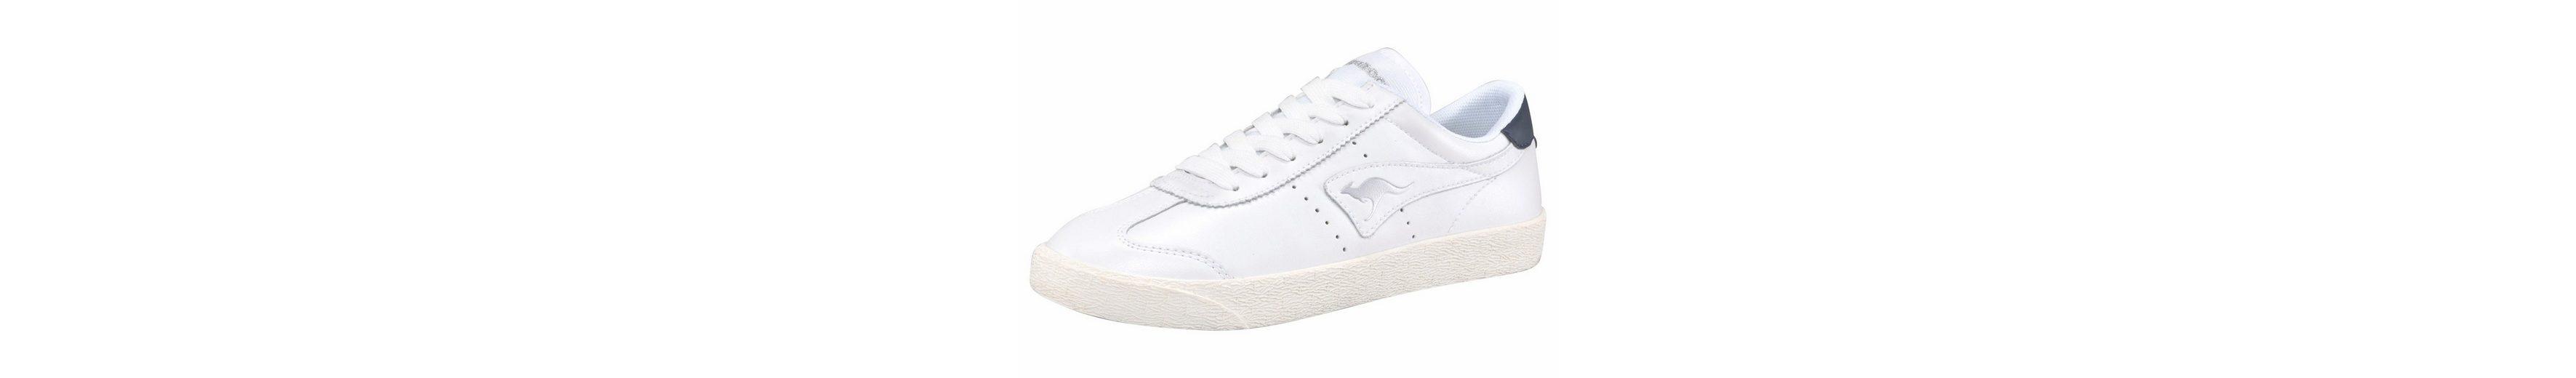 Billig Verkauf Empfehlen Verkauf KangaROOS Chako Sneaker kuJ84mgkou